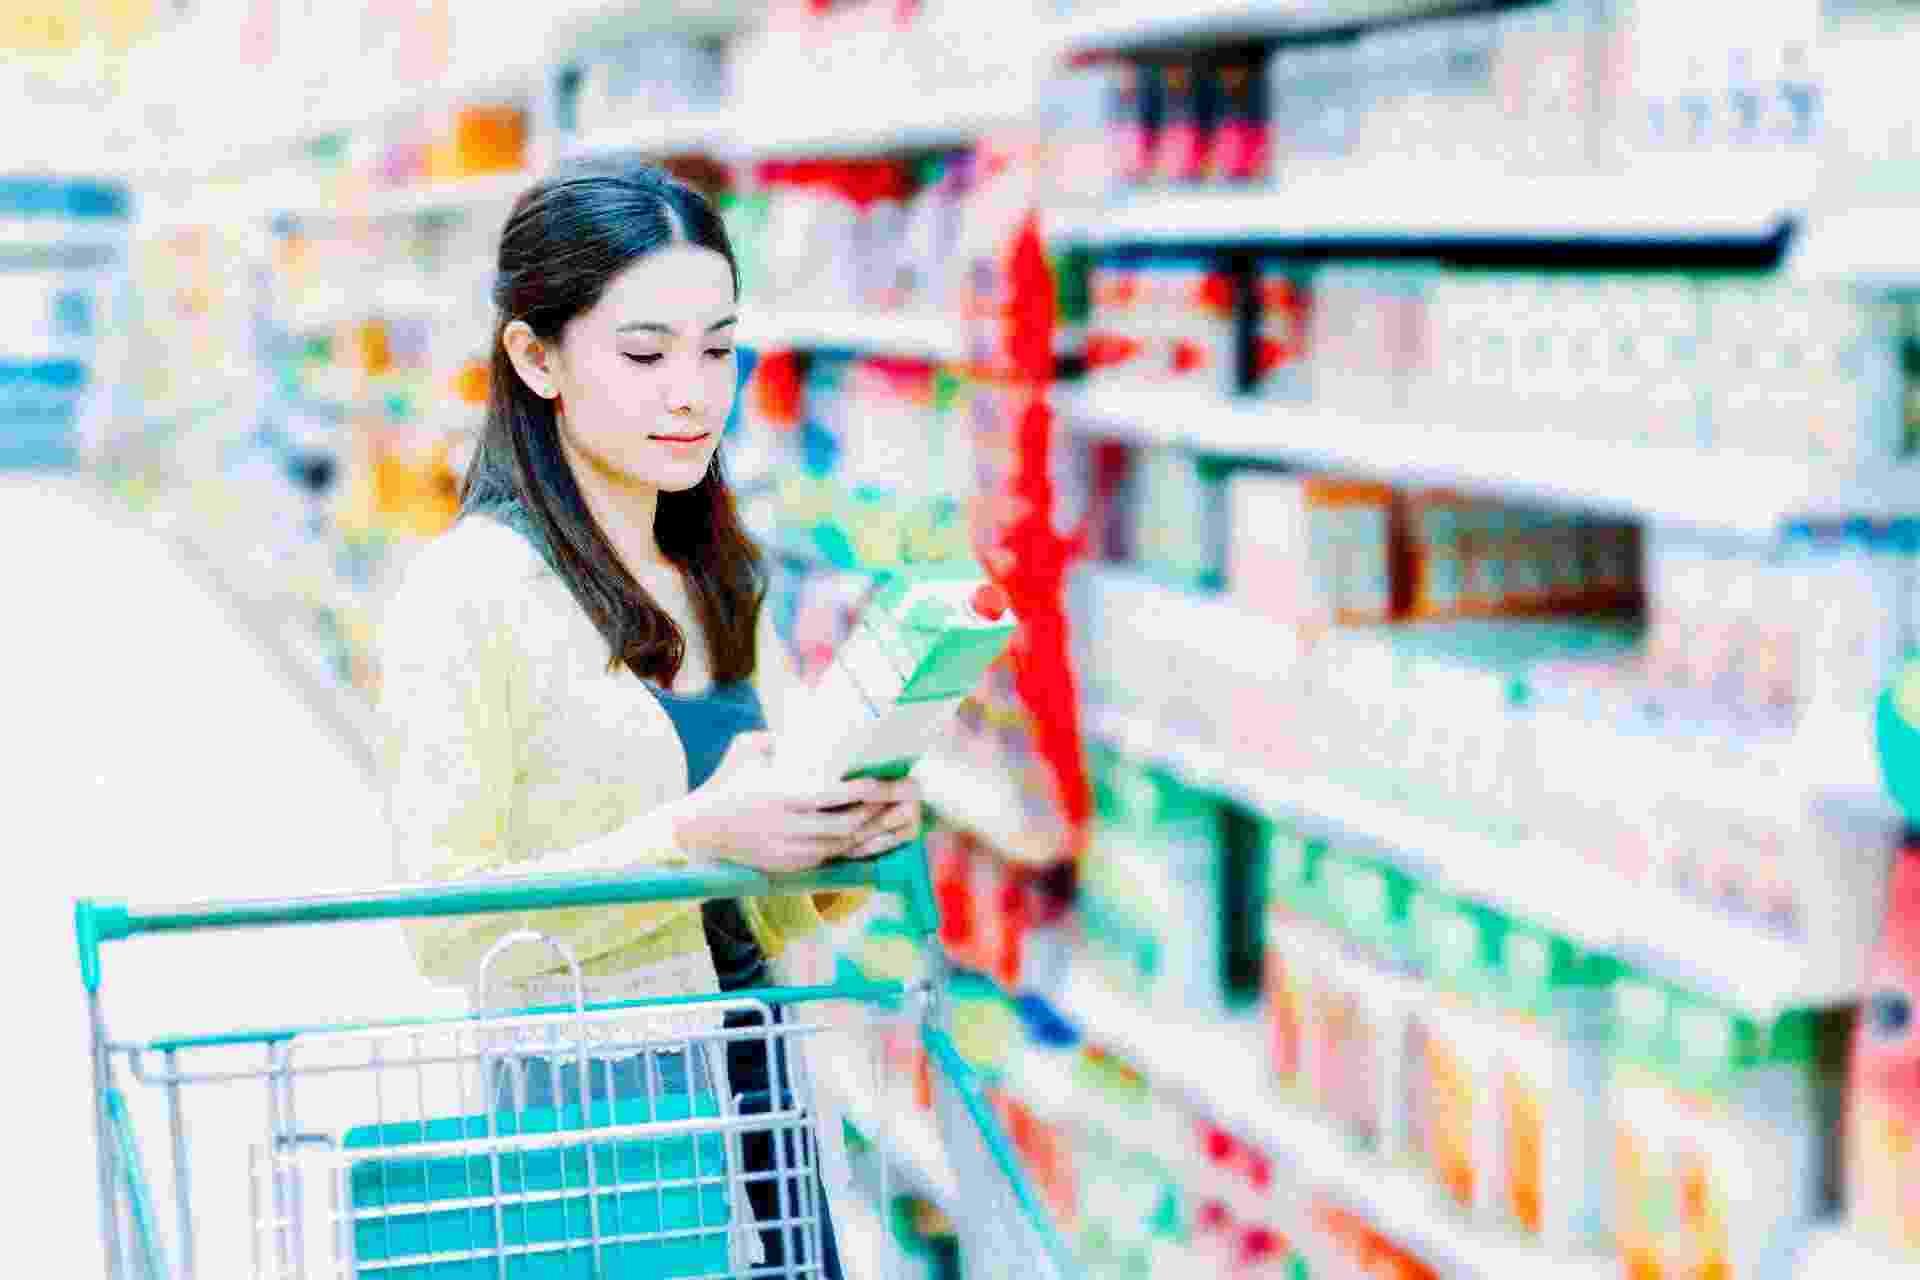 Suco de caixinha, supermercado - iStock